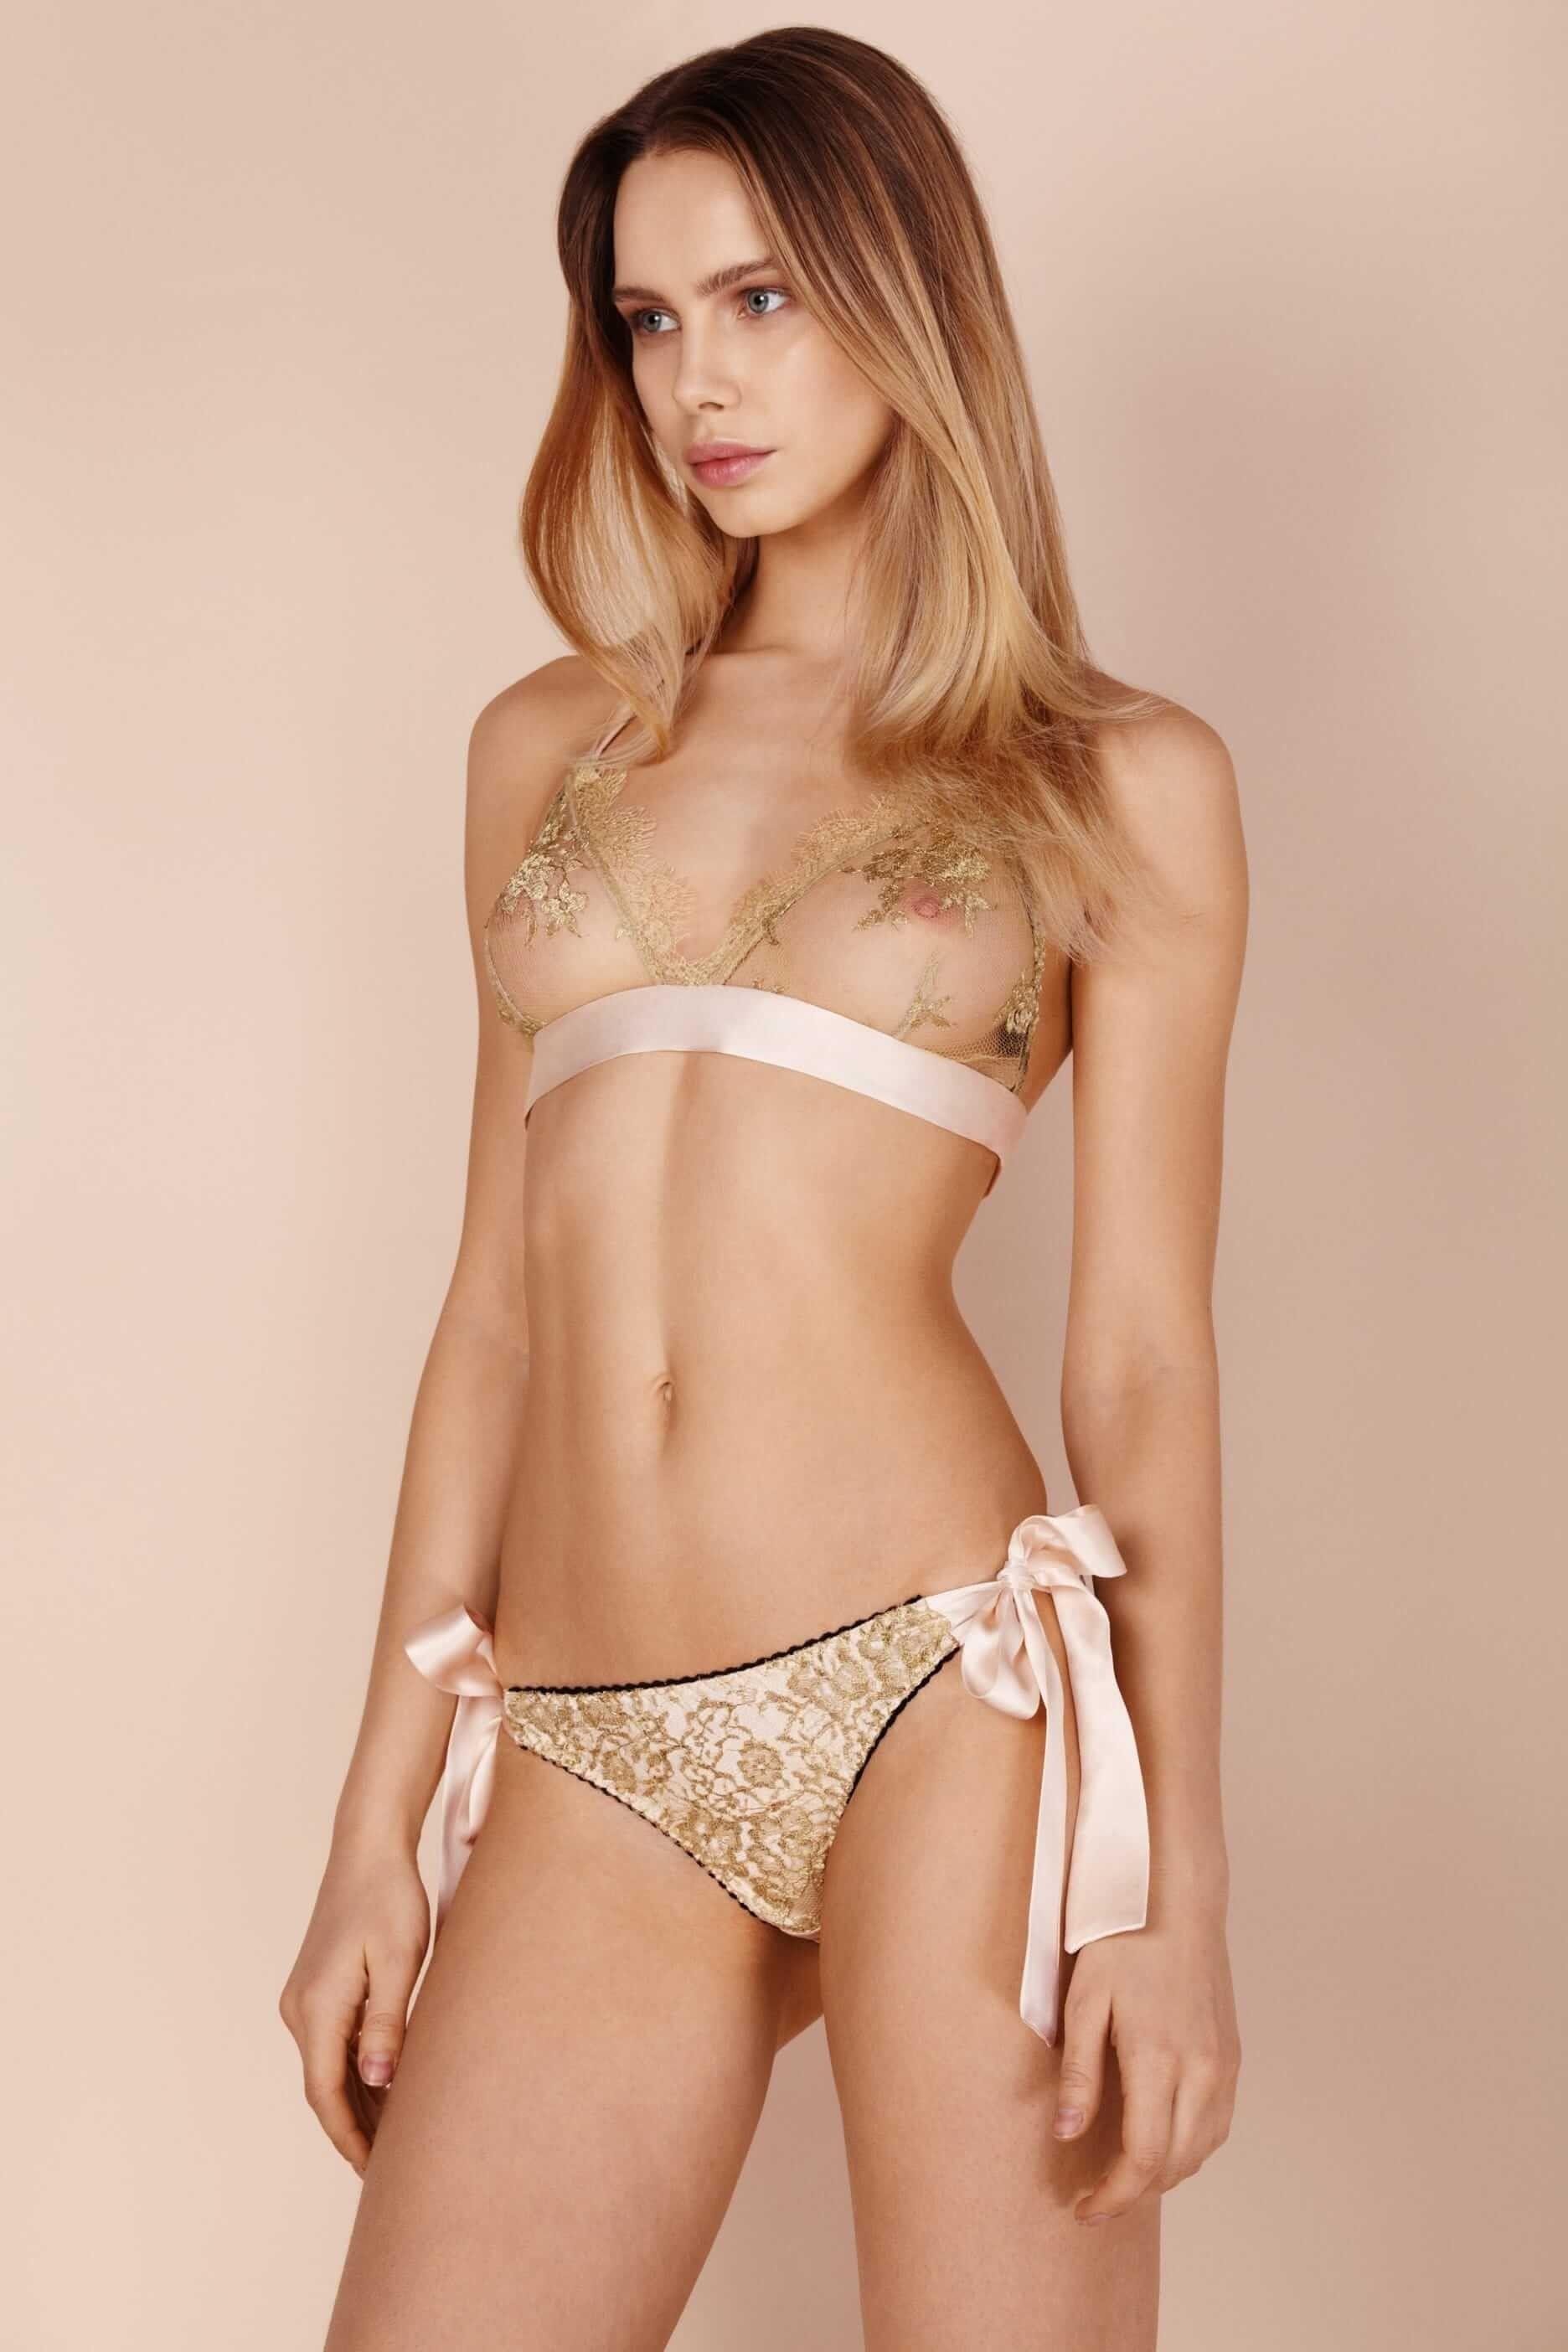 Nude pics of heather tesche